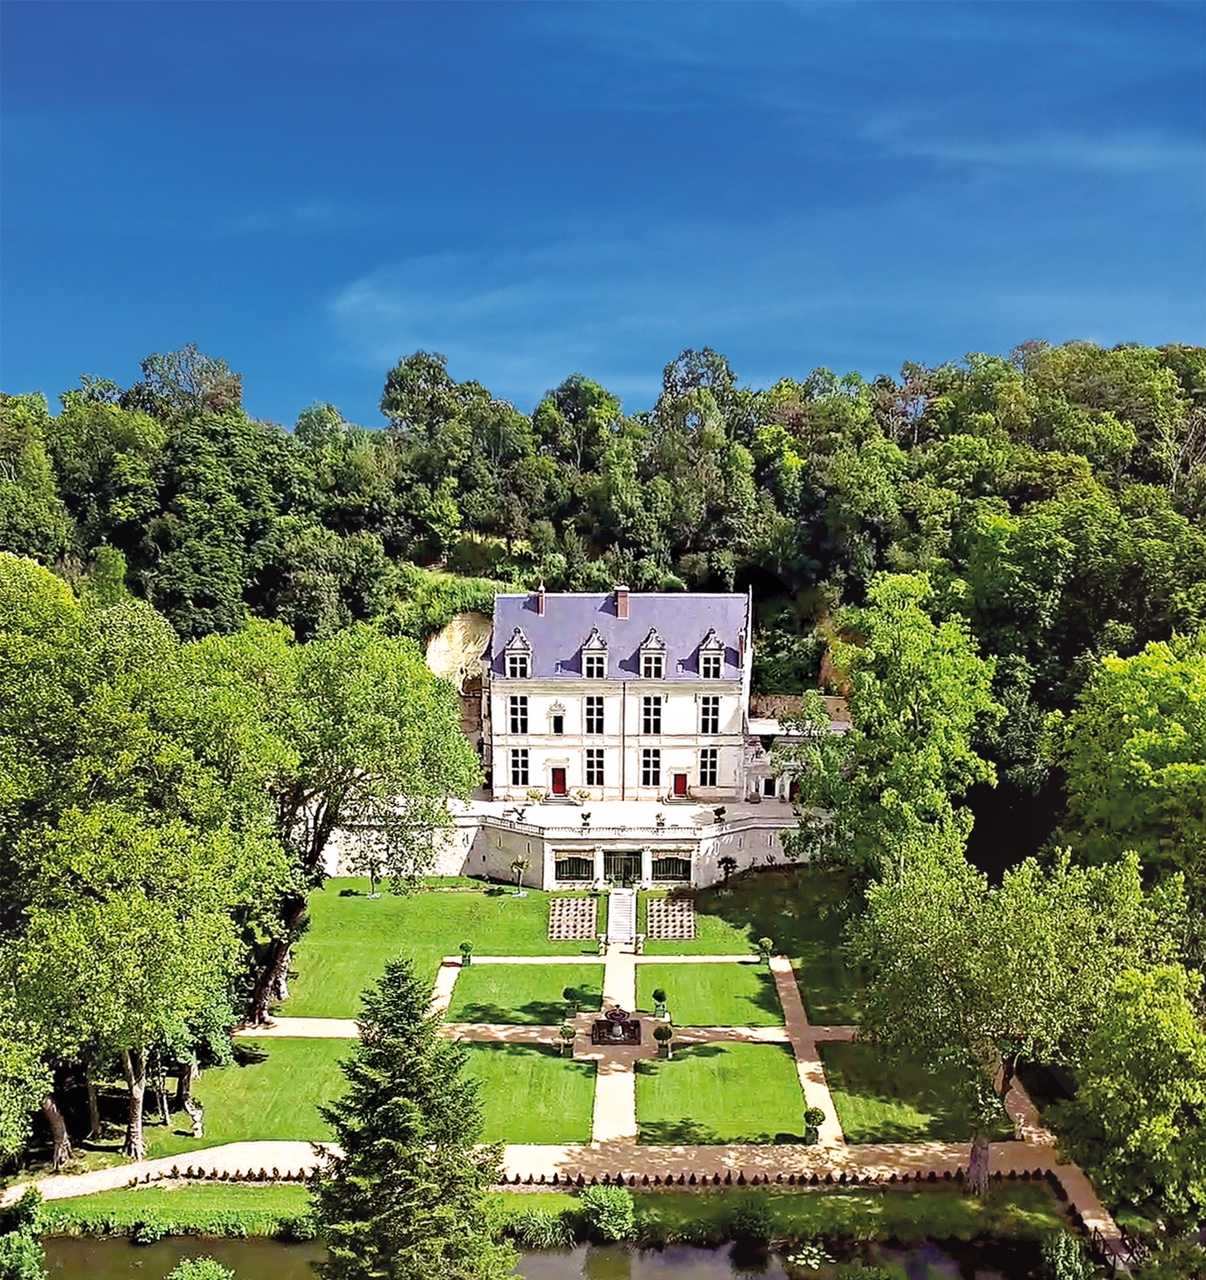 473-chateau-gaillard_amboise.jpg